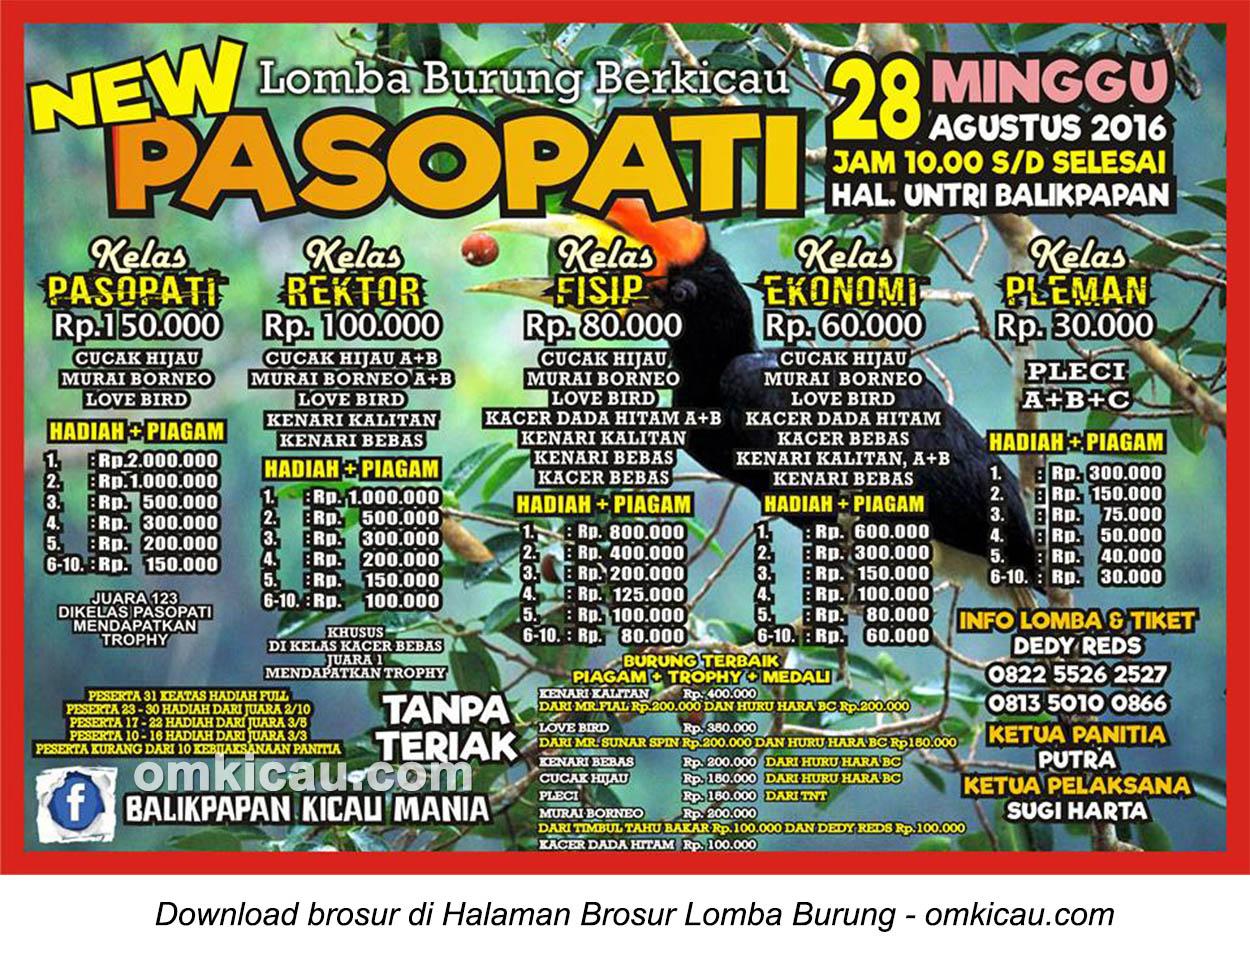 Brosur Lomba Burung Berkicau New Pasopati, Balikpapan, 28 Agustus 2016